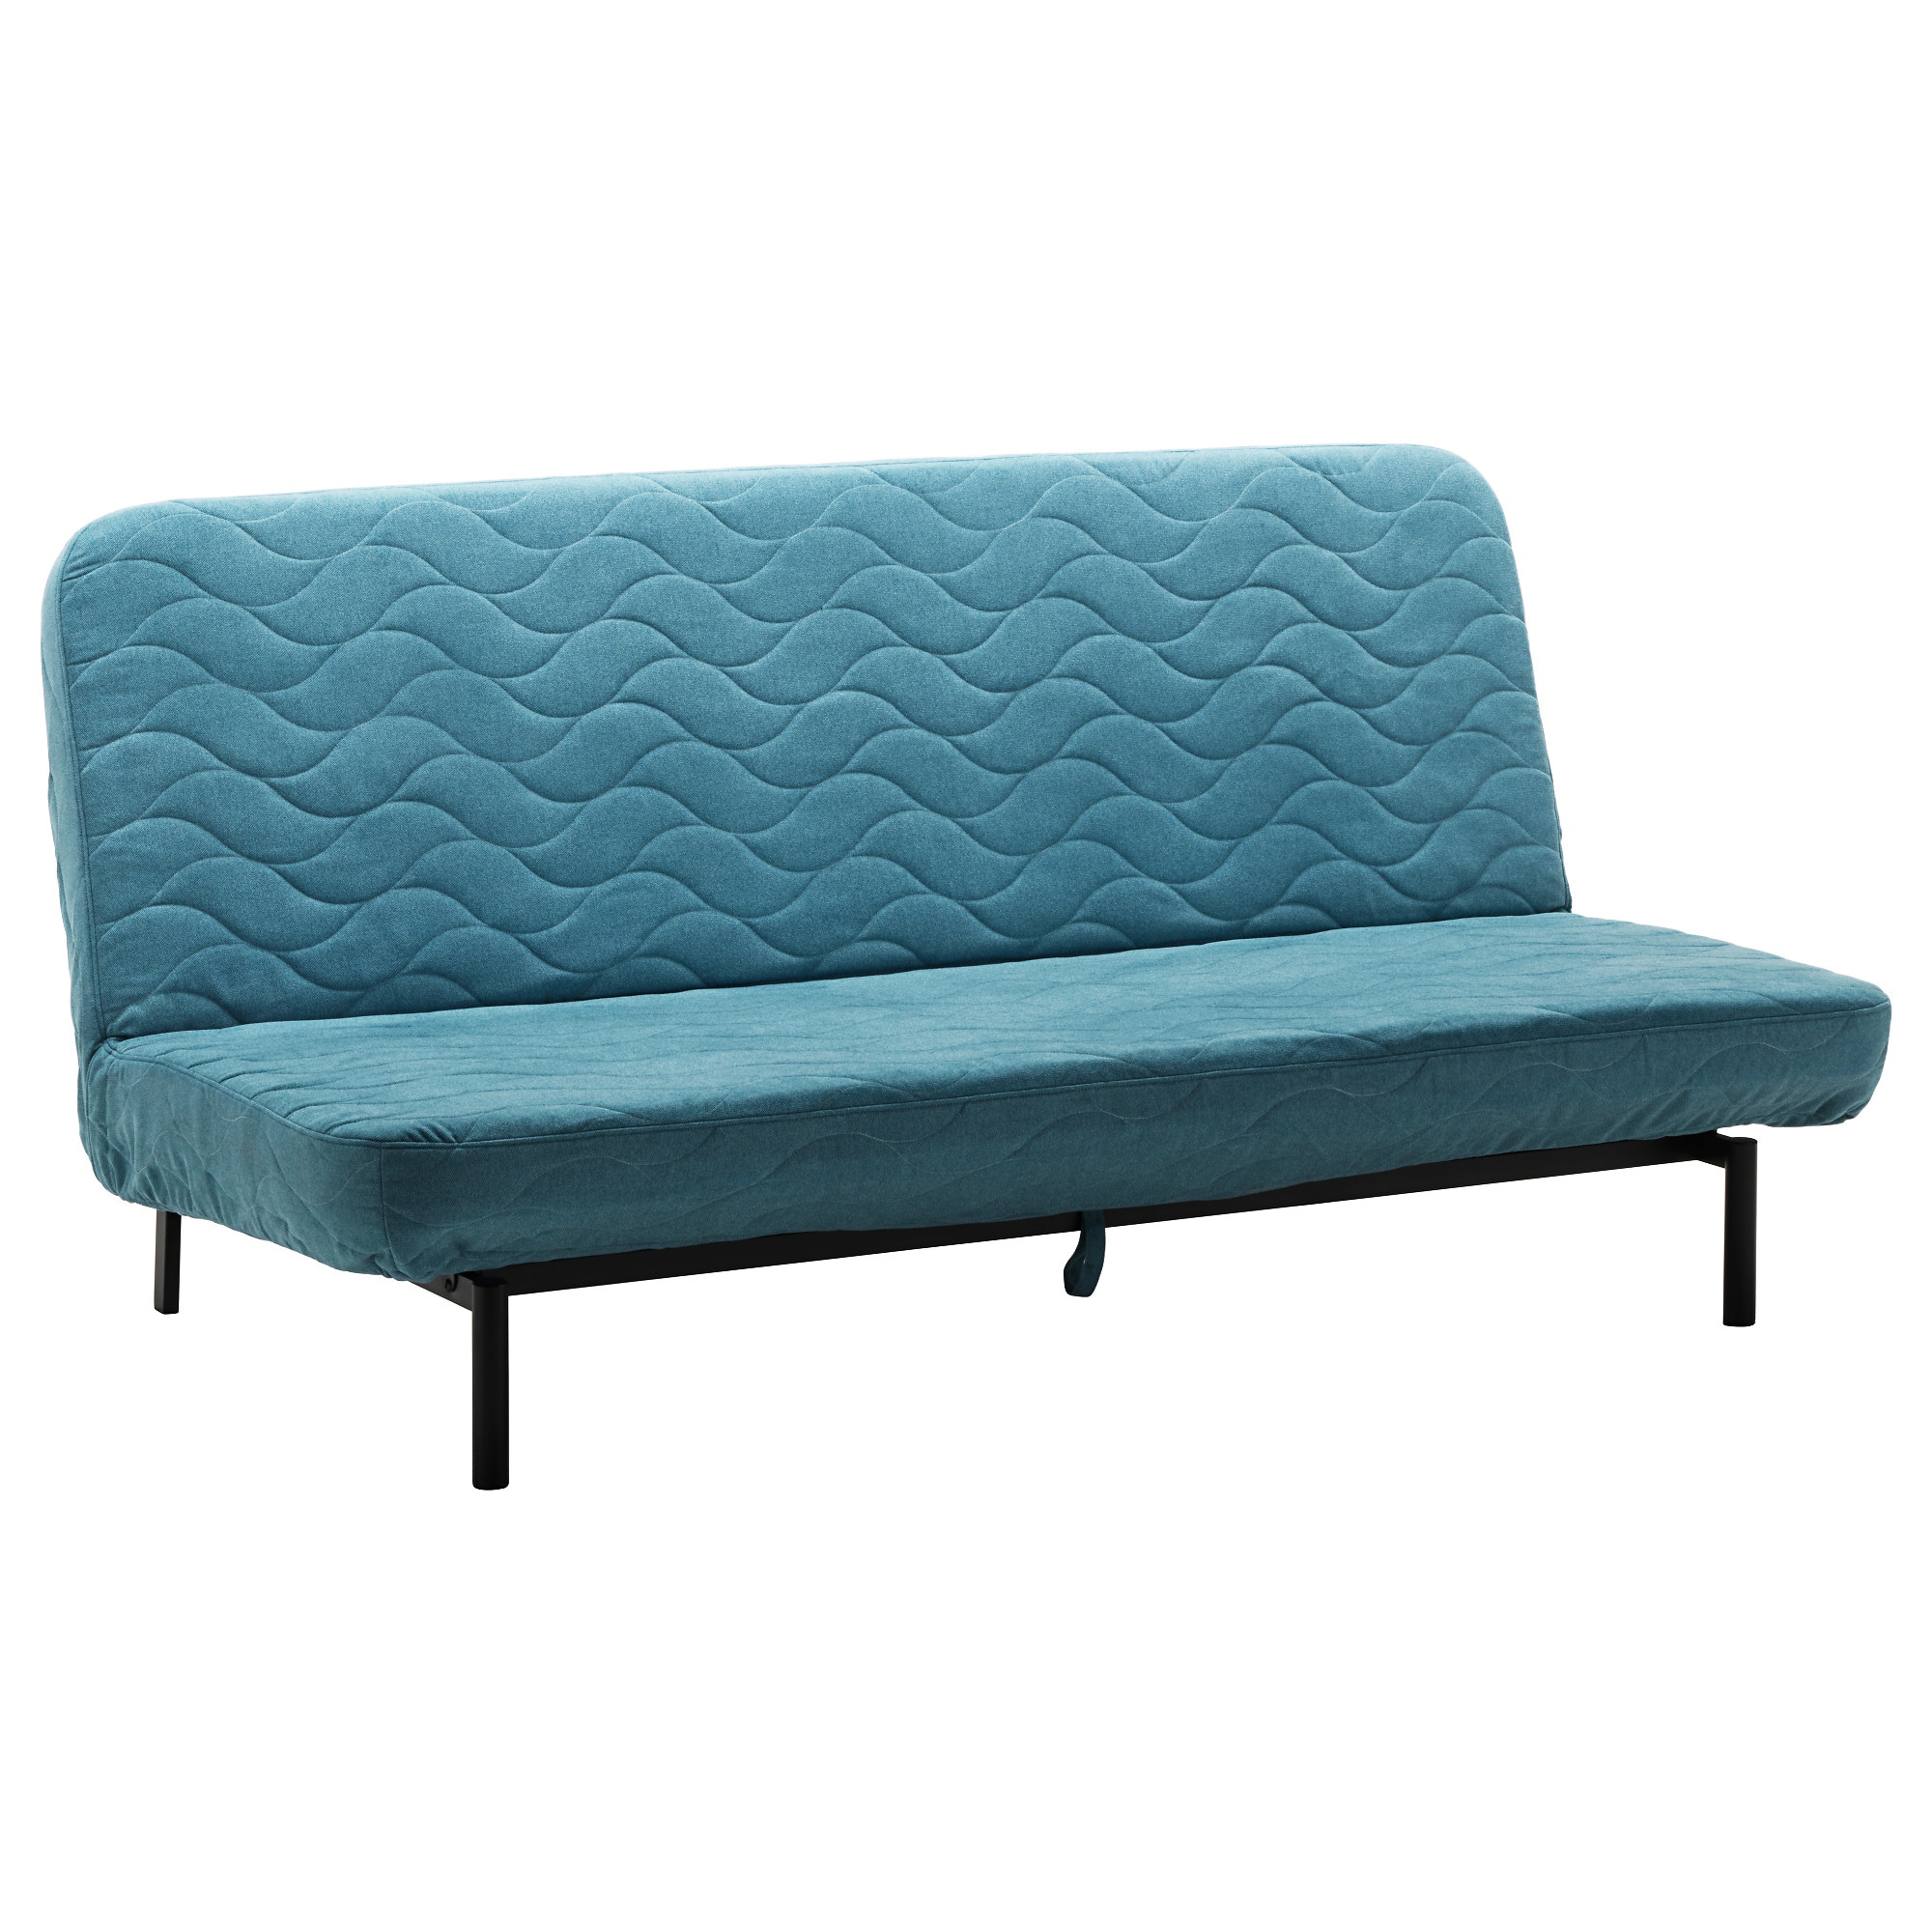 Sofa Cama Italiano Ikea Q0d4 sofà S Cama De Calidad Pra Online Ikea